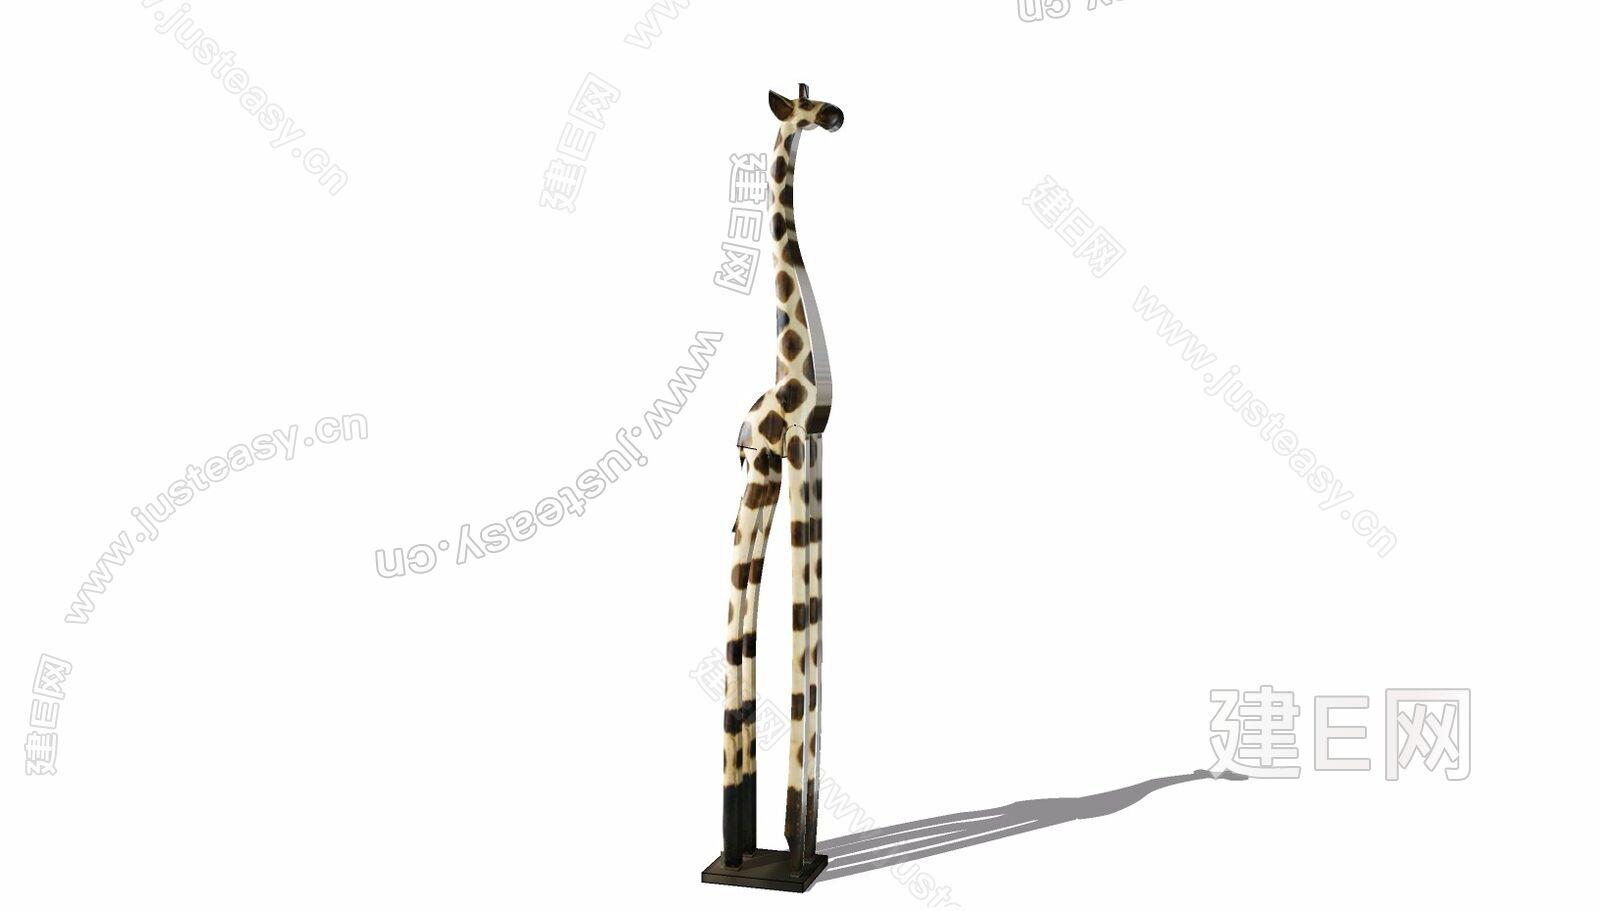 长颈鹿sketchup模型